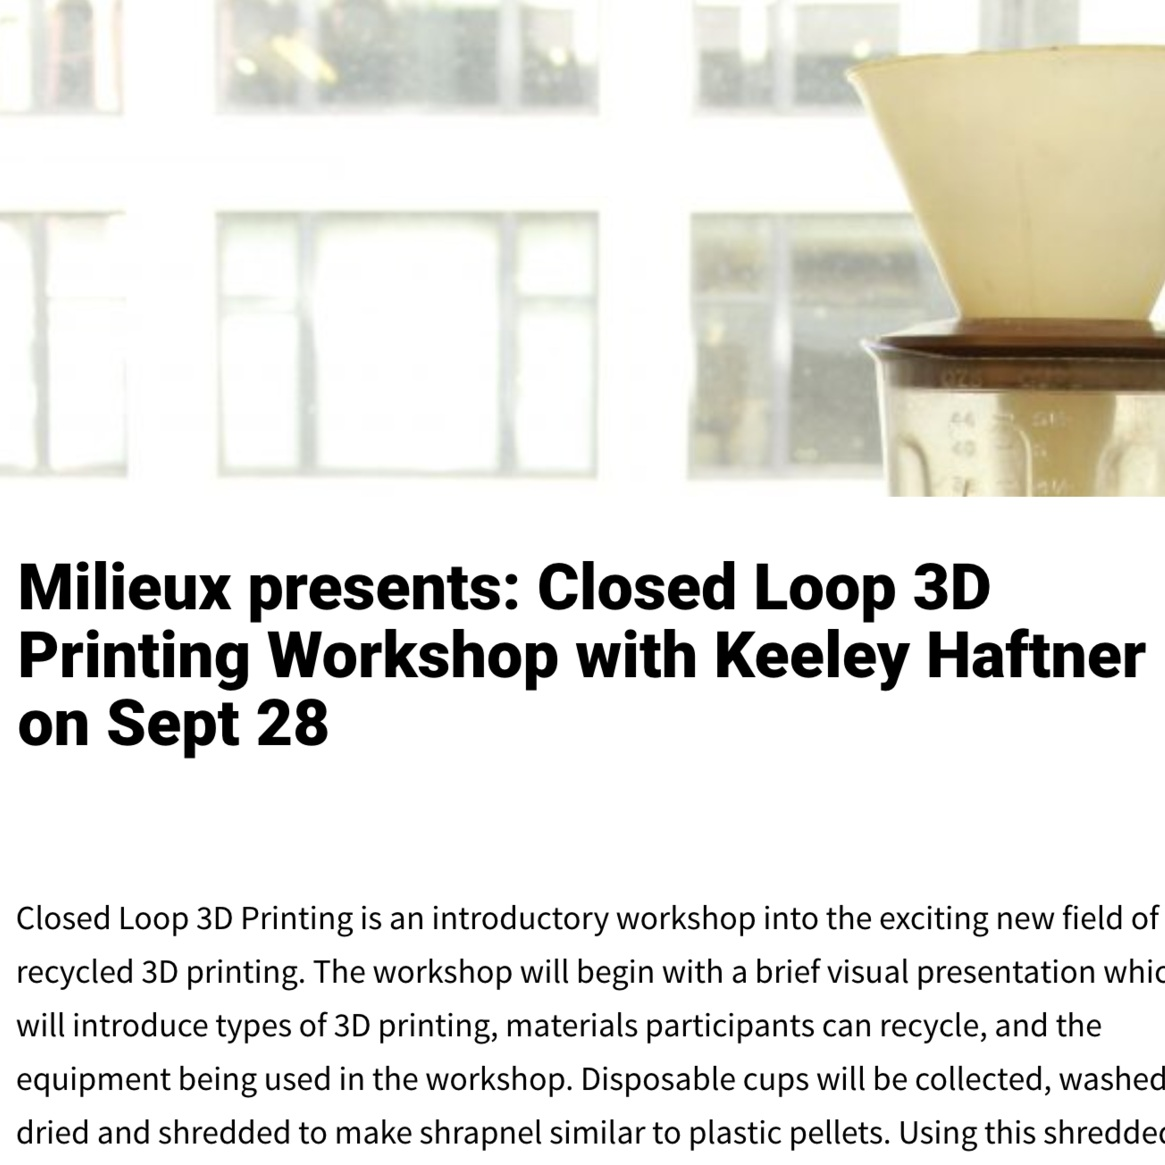 2016: Closed Loop 3D Printing